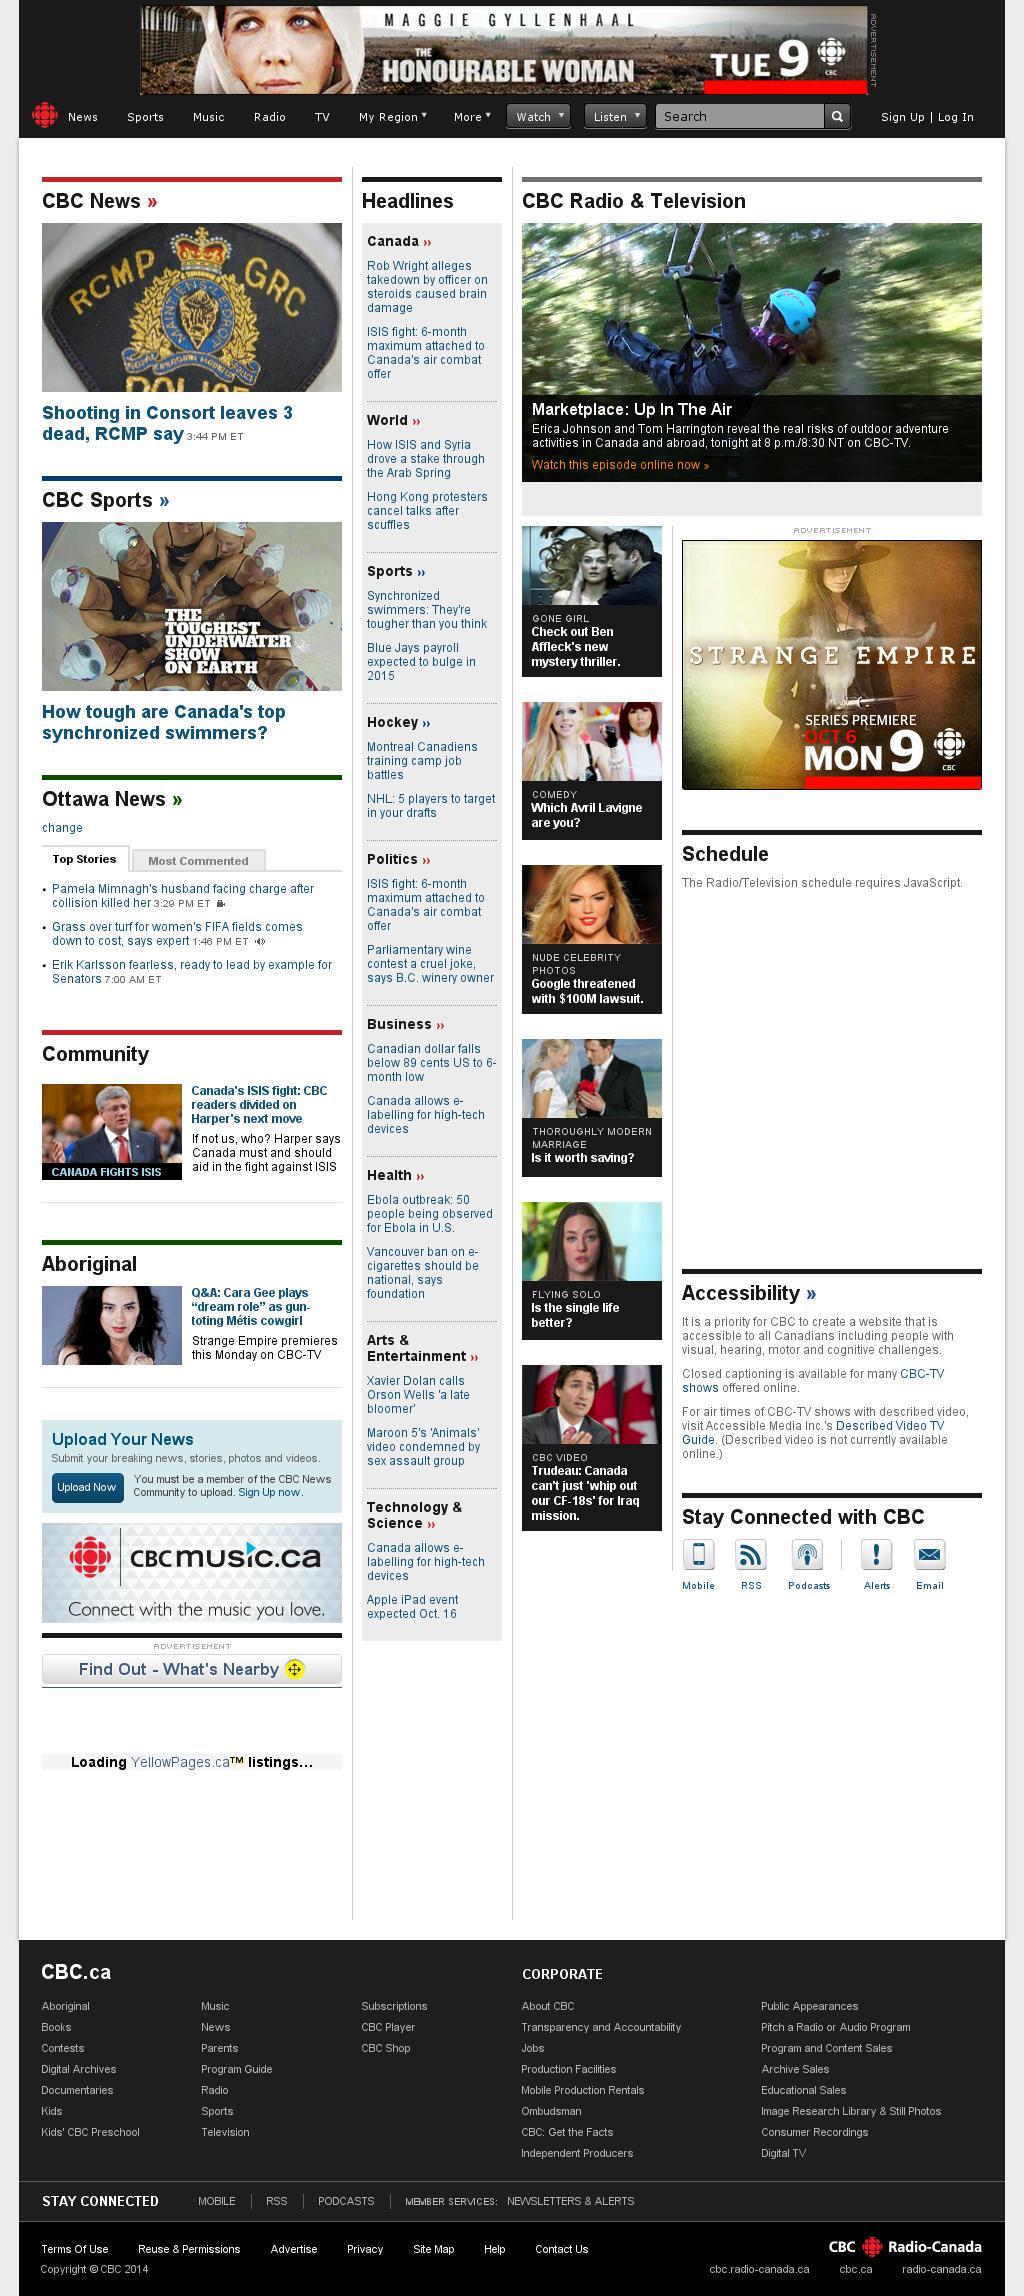 CBC at Friday Oct. 3, 2014, 8:01 p.m. UTC